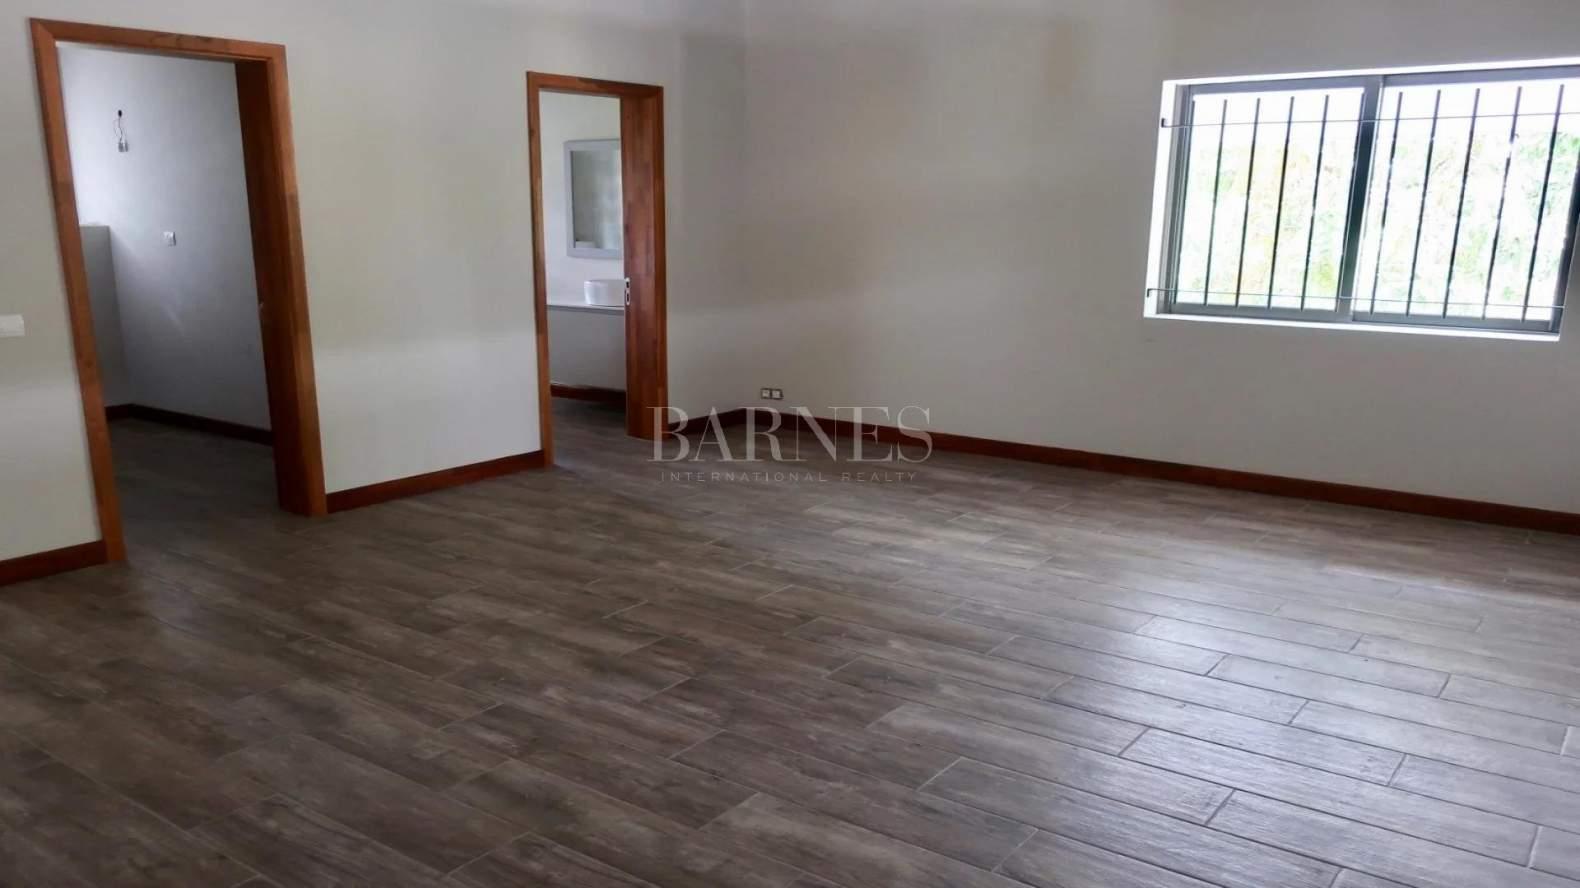 Vacoas-Phoenix  - House 3 Bedrooms - picture 3